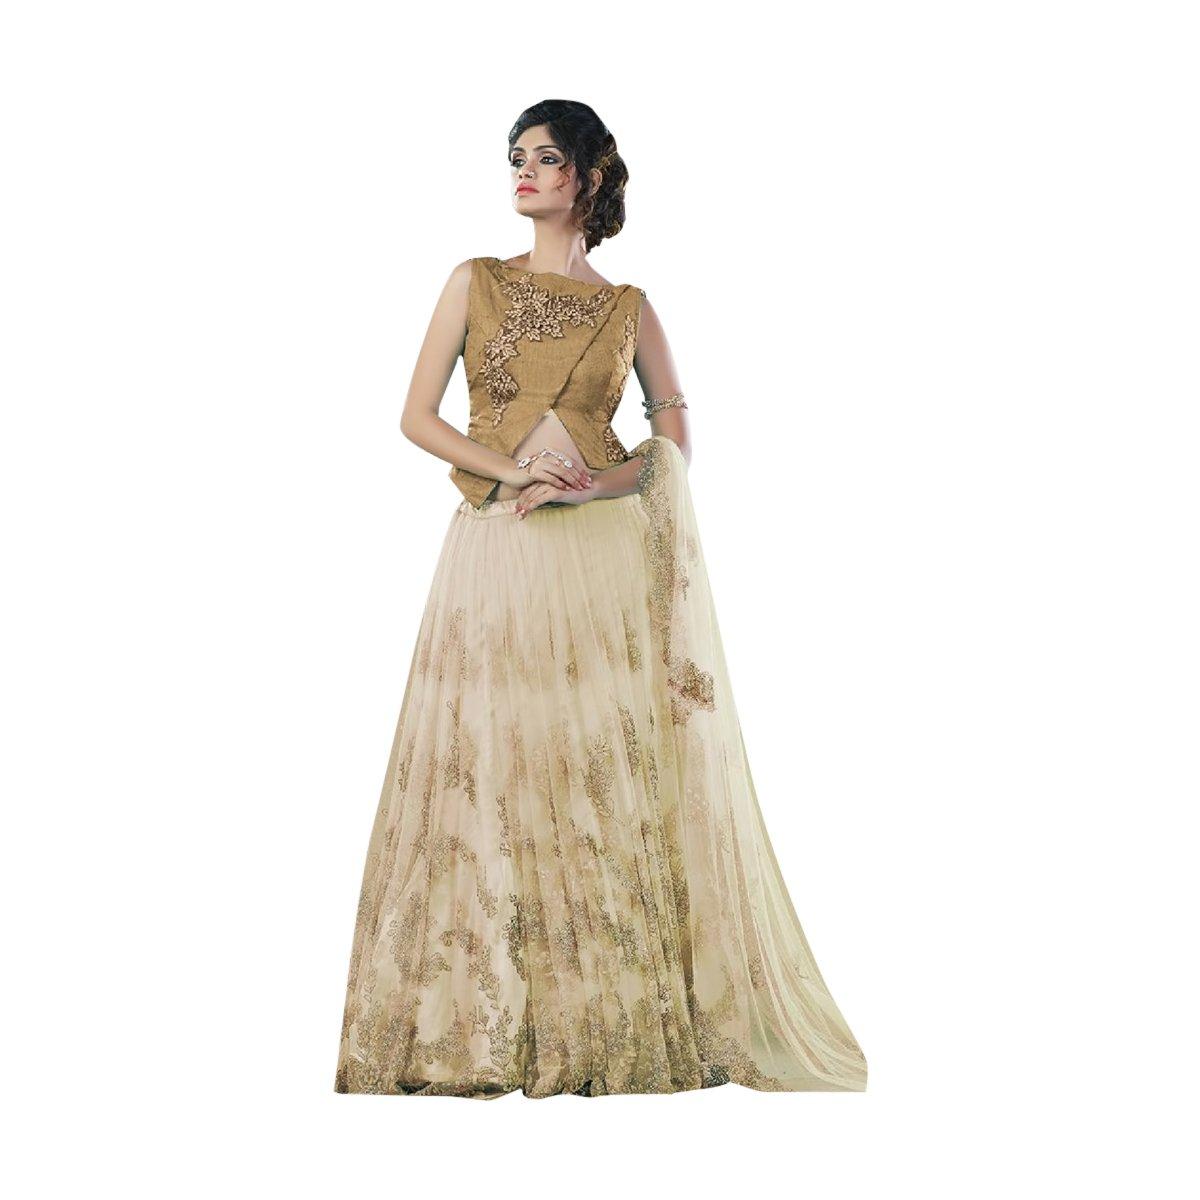 Bollywood Bridal Women Collection Lehenga Choli Dupatta Ceremony Wedding 619